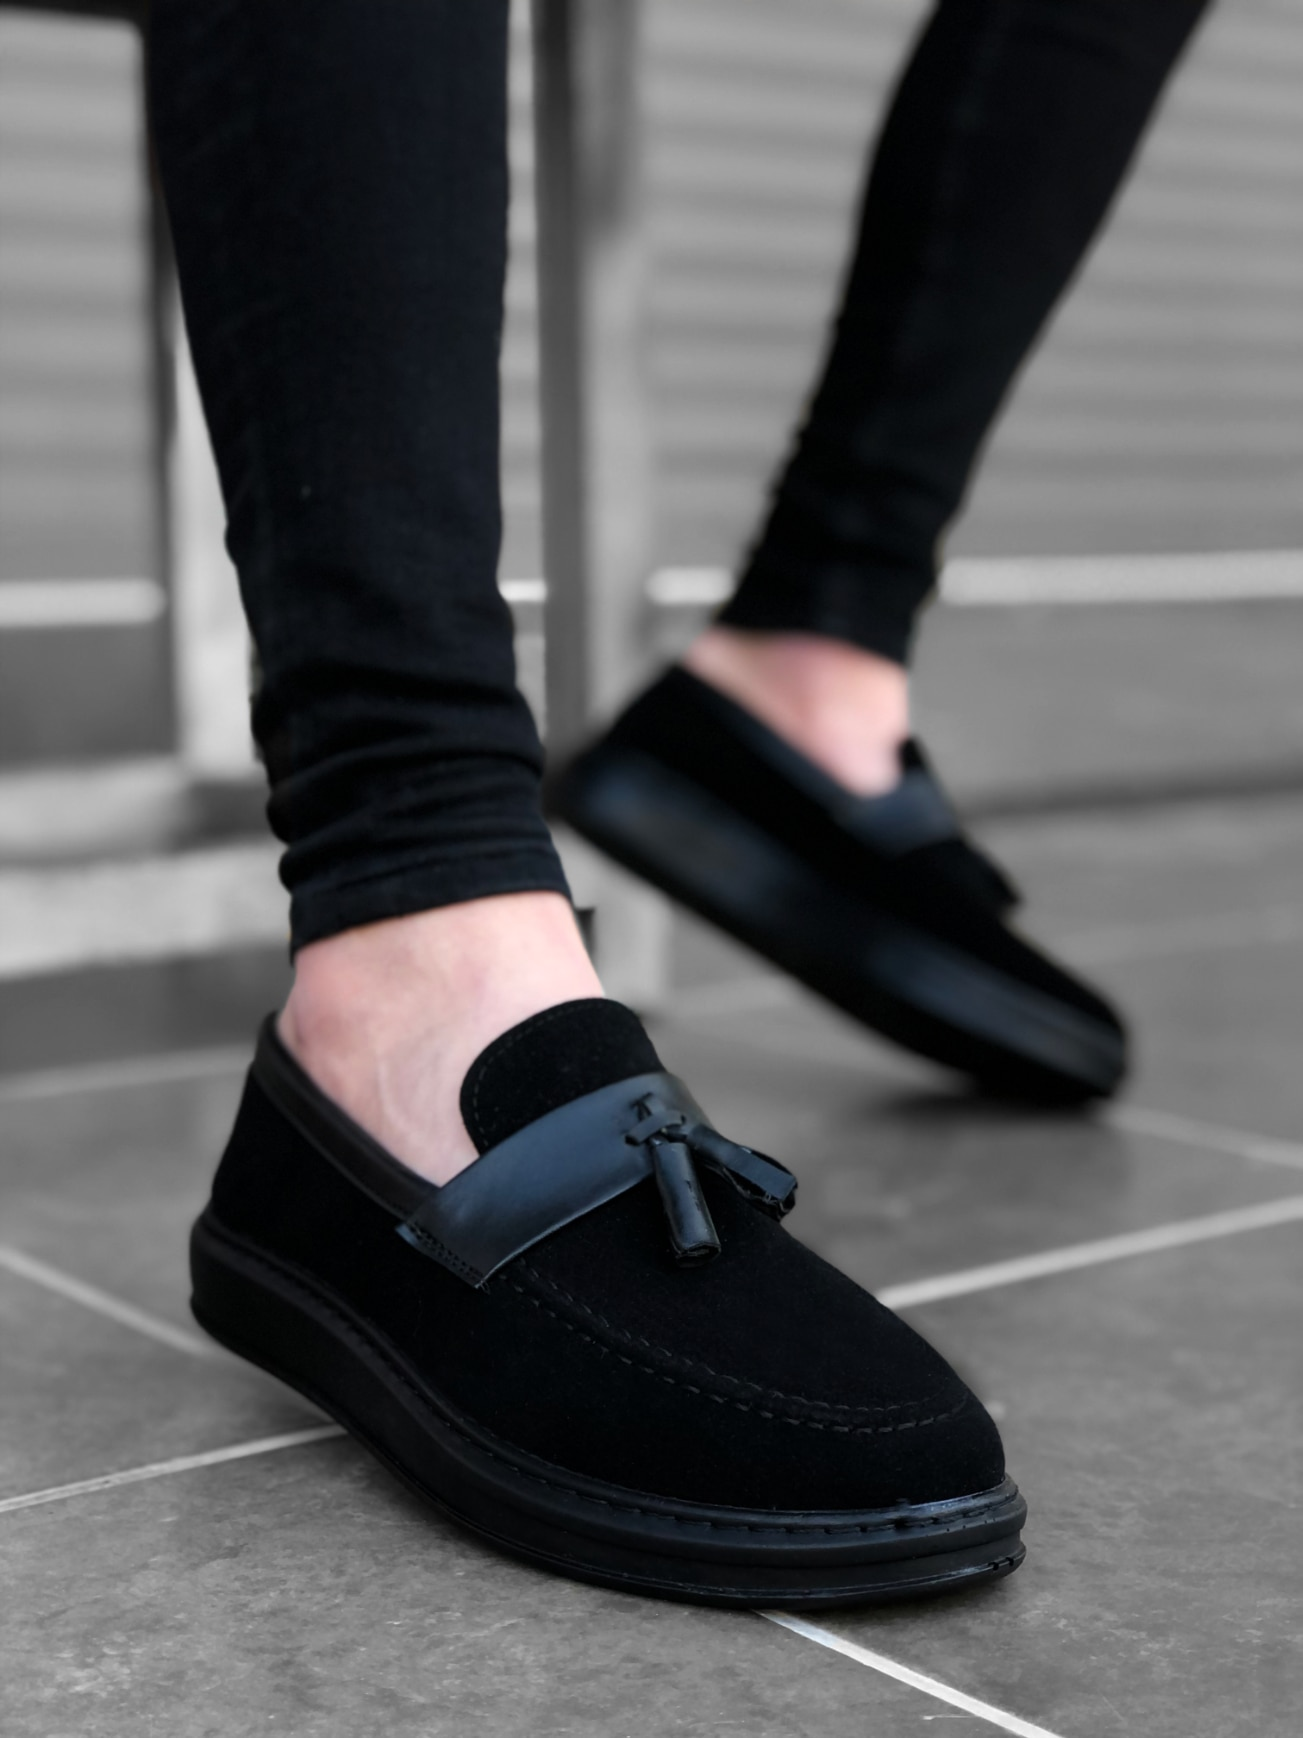 ALTEA BA0005 الرجال حذاء كاجوال أحذية الكتان الموسمية عالية قاعدة براءات الاختراع والجلود أحذية مشي العظام الكلاسيكية Tasseled Corcik